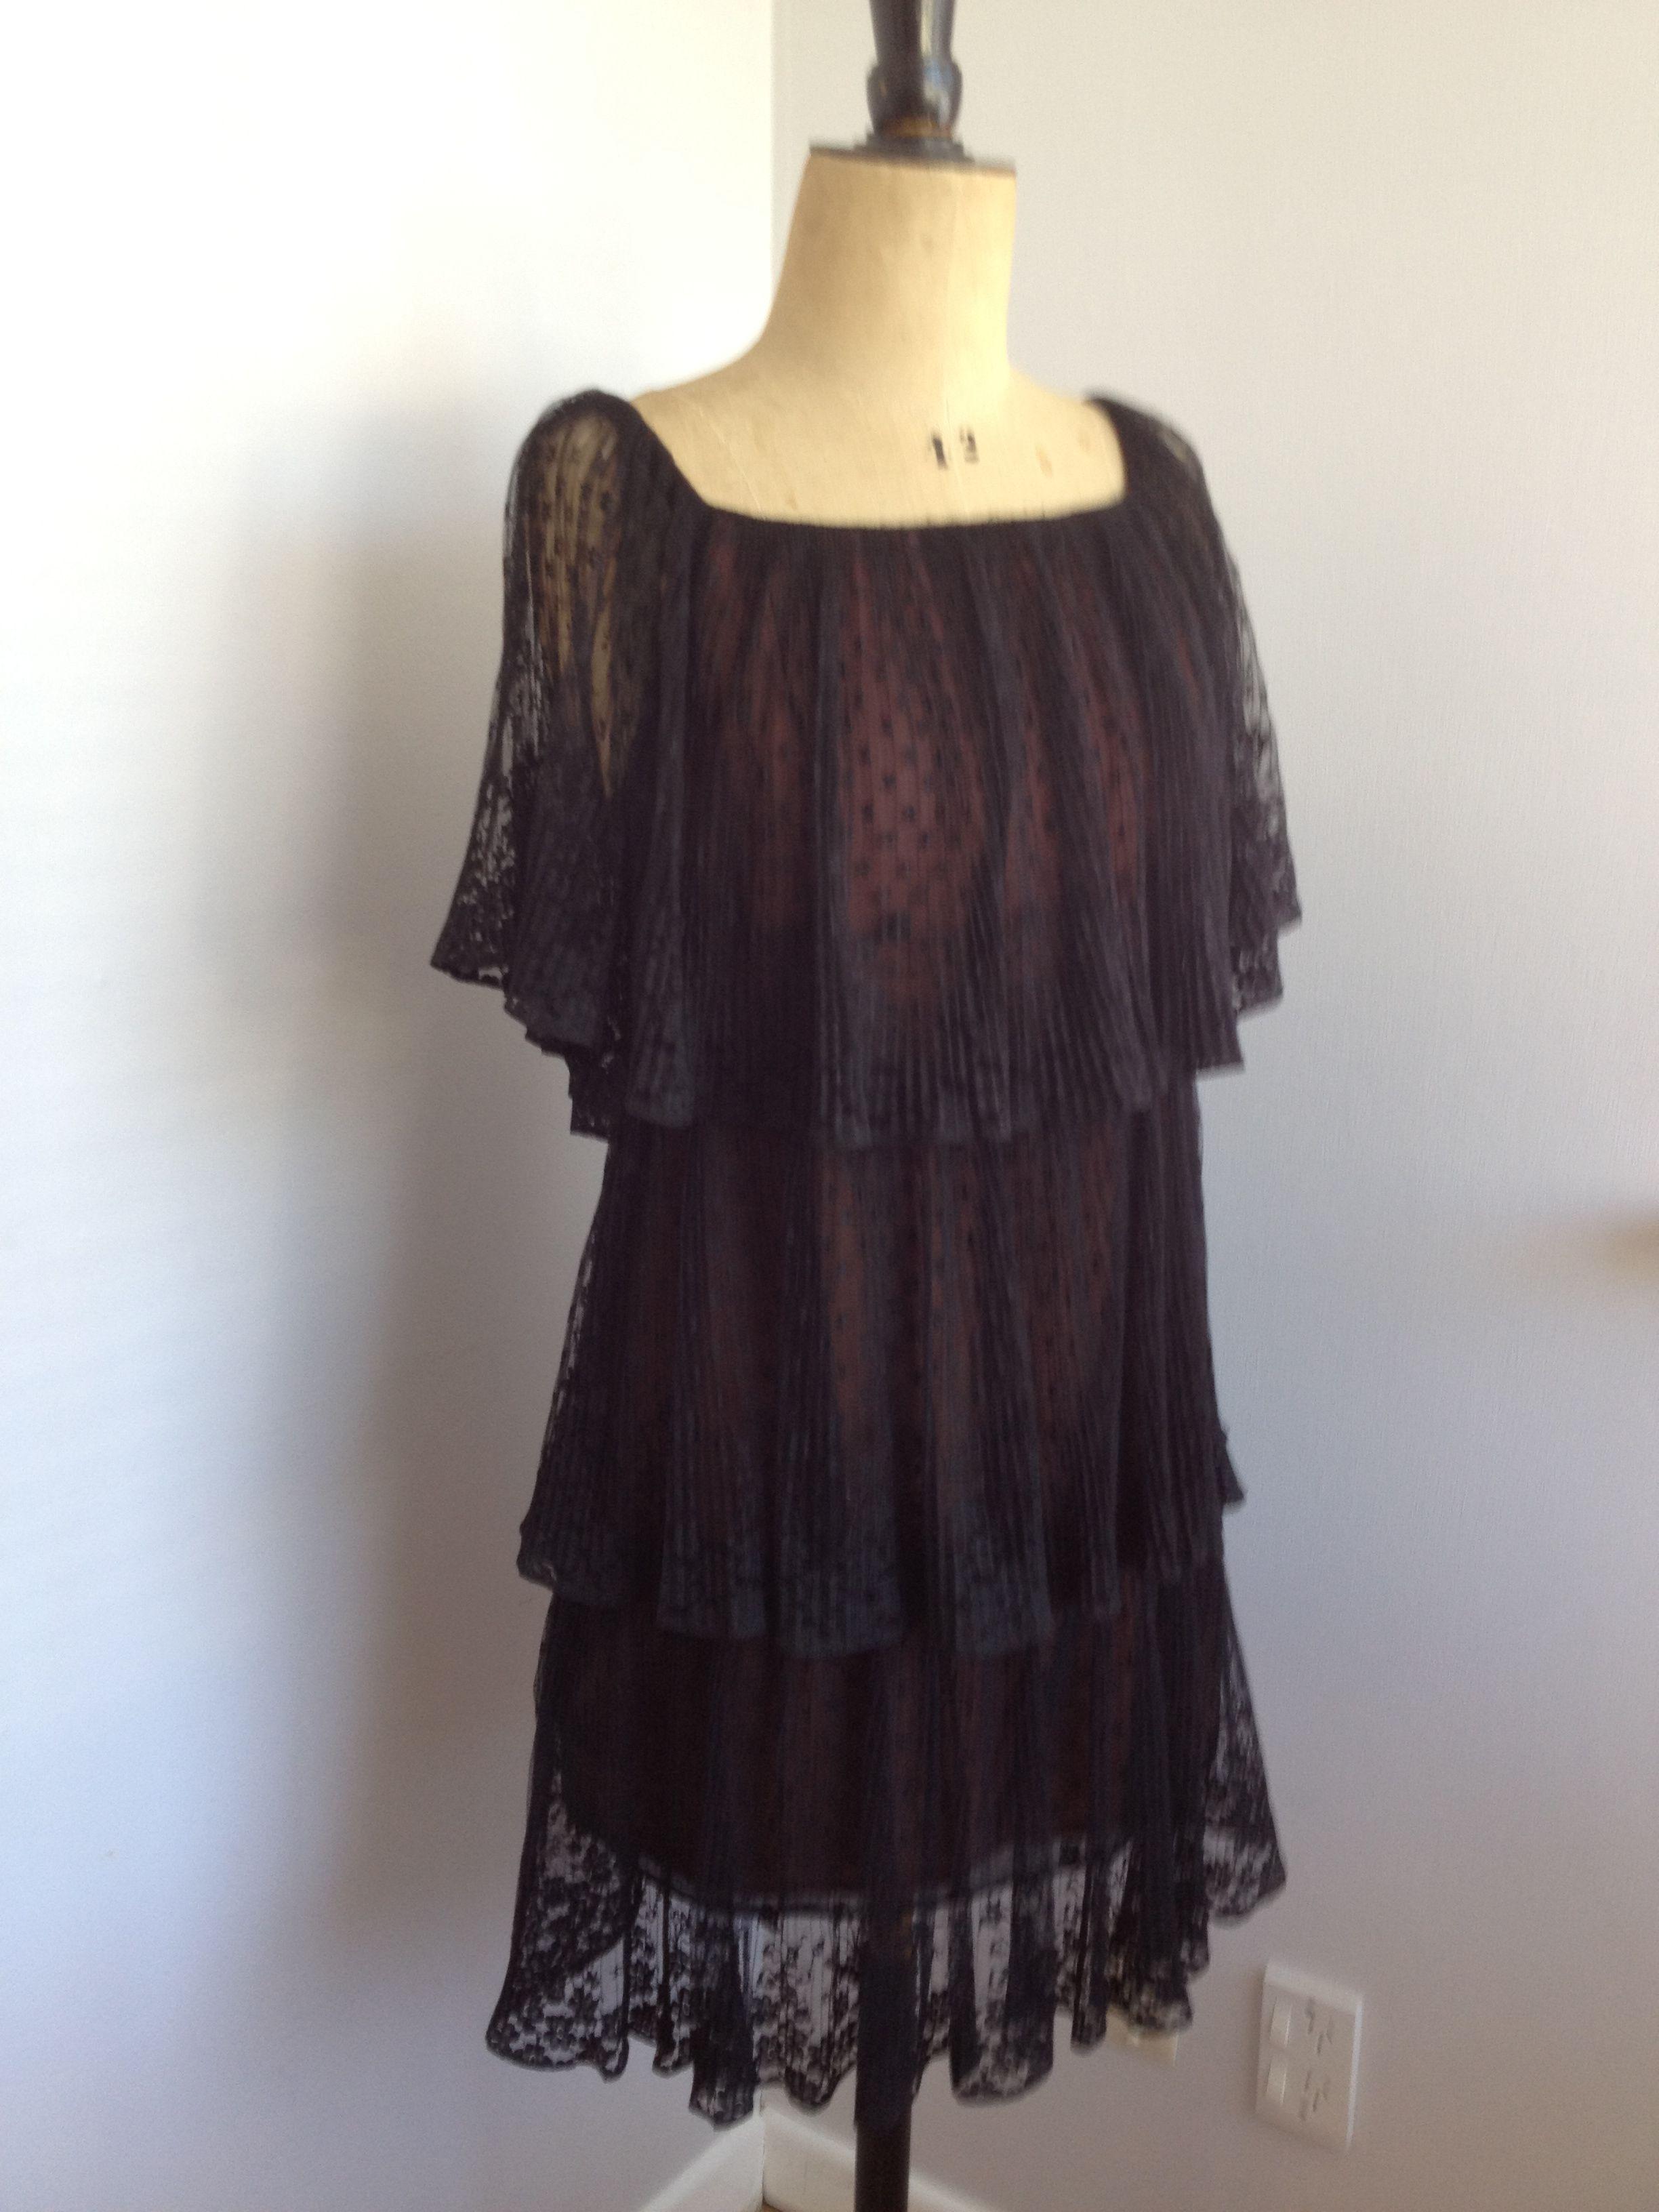 late 70s american designer dress Marita by Anthony Muto | ANTHONY ...